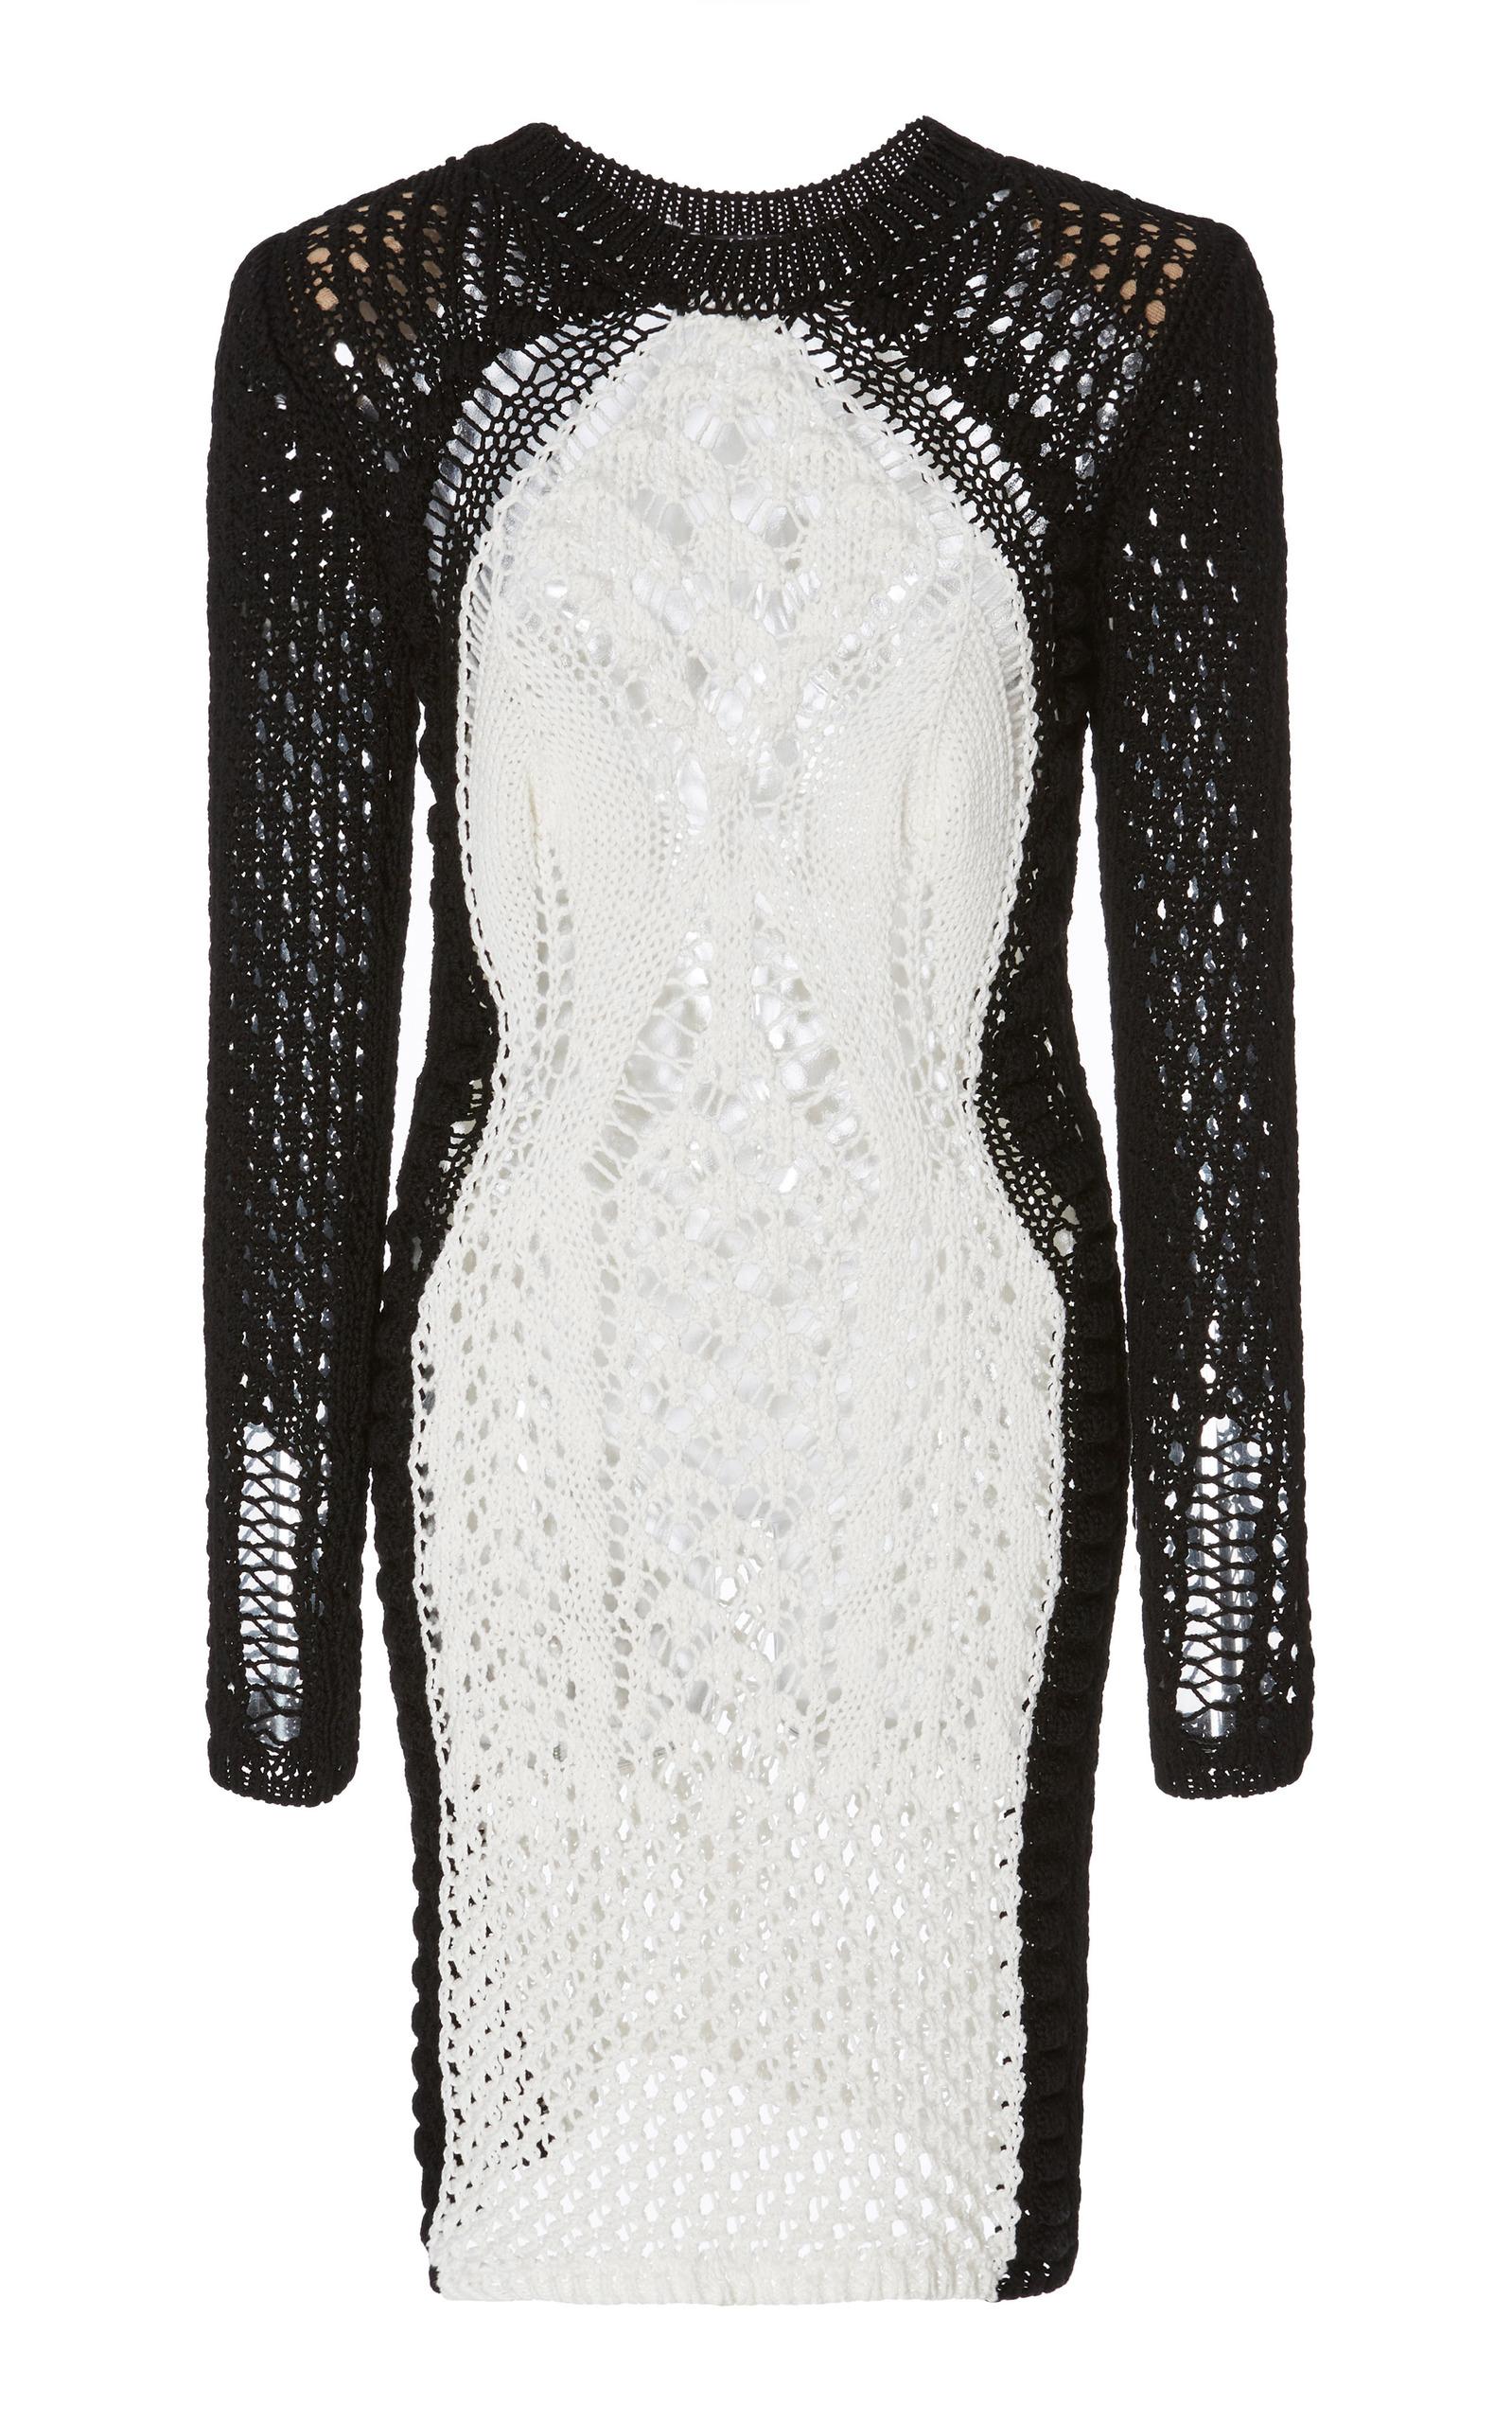 891de1a44a Crochet Mini Dress by Balmain   Moda Operandi